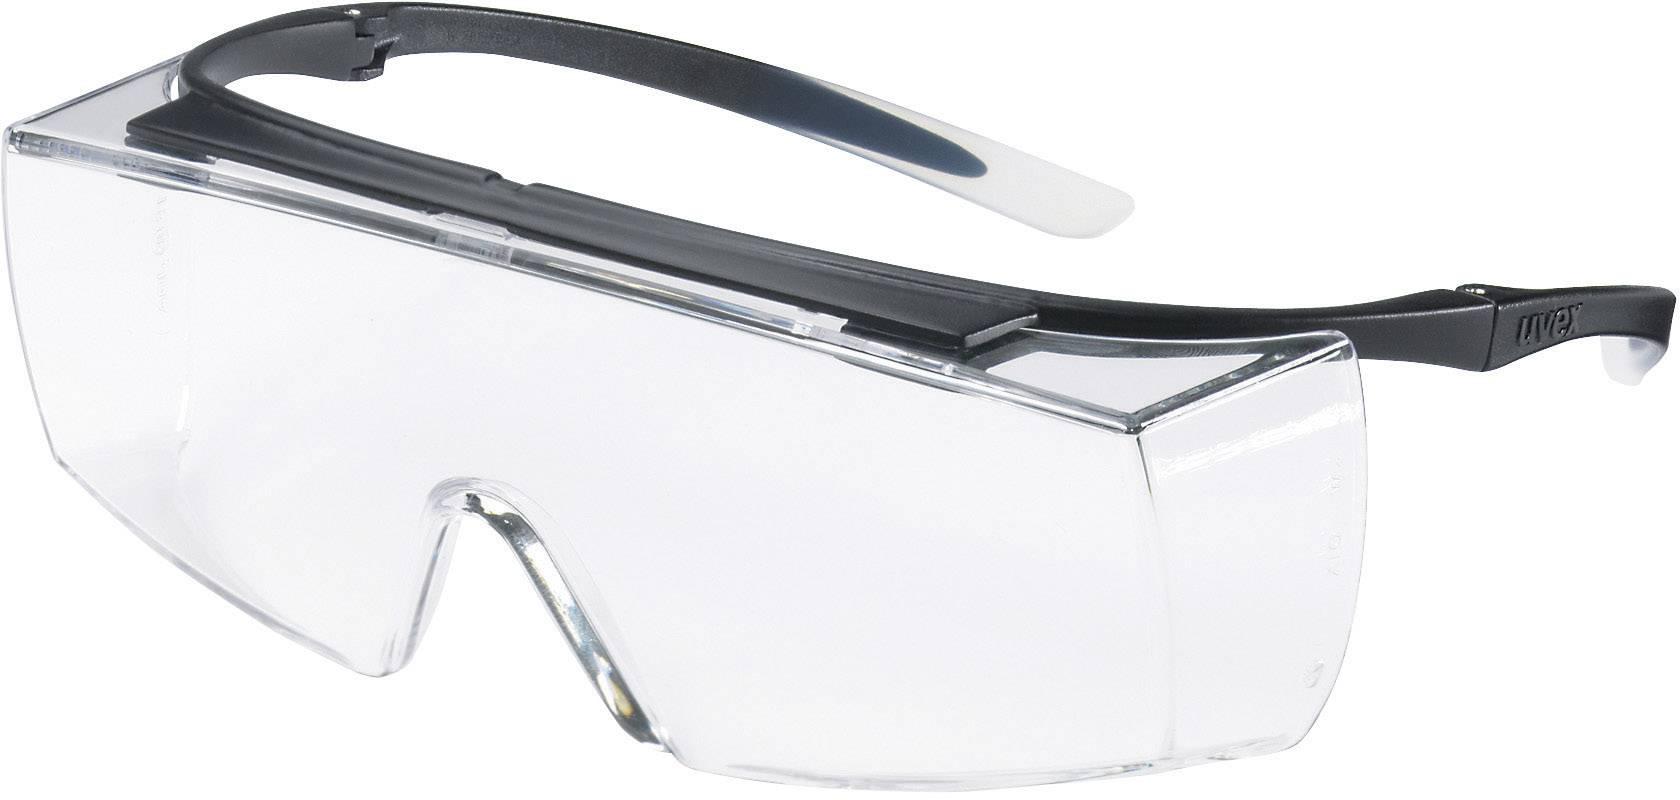 Transparent//Schwarz Uvex Super Fit Schutzbrille Supravision Plus